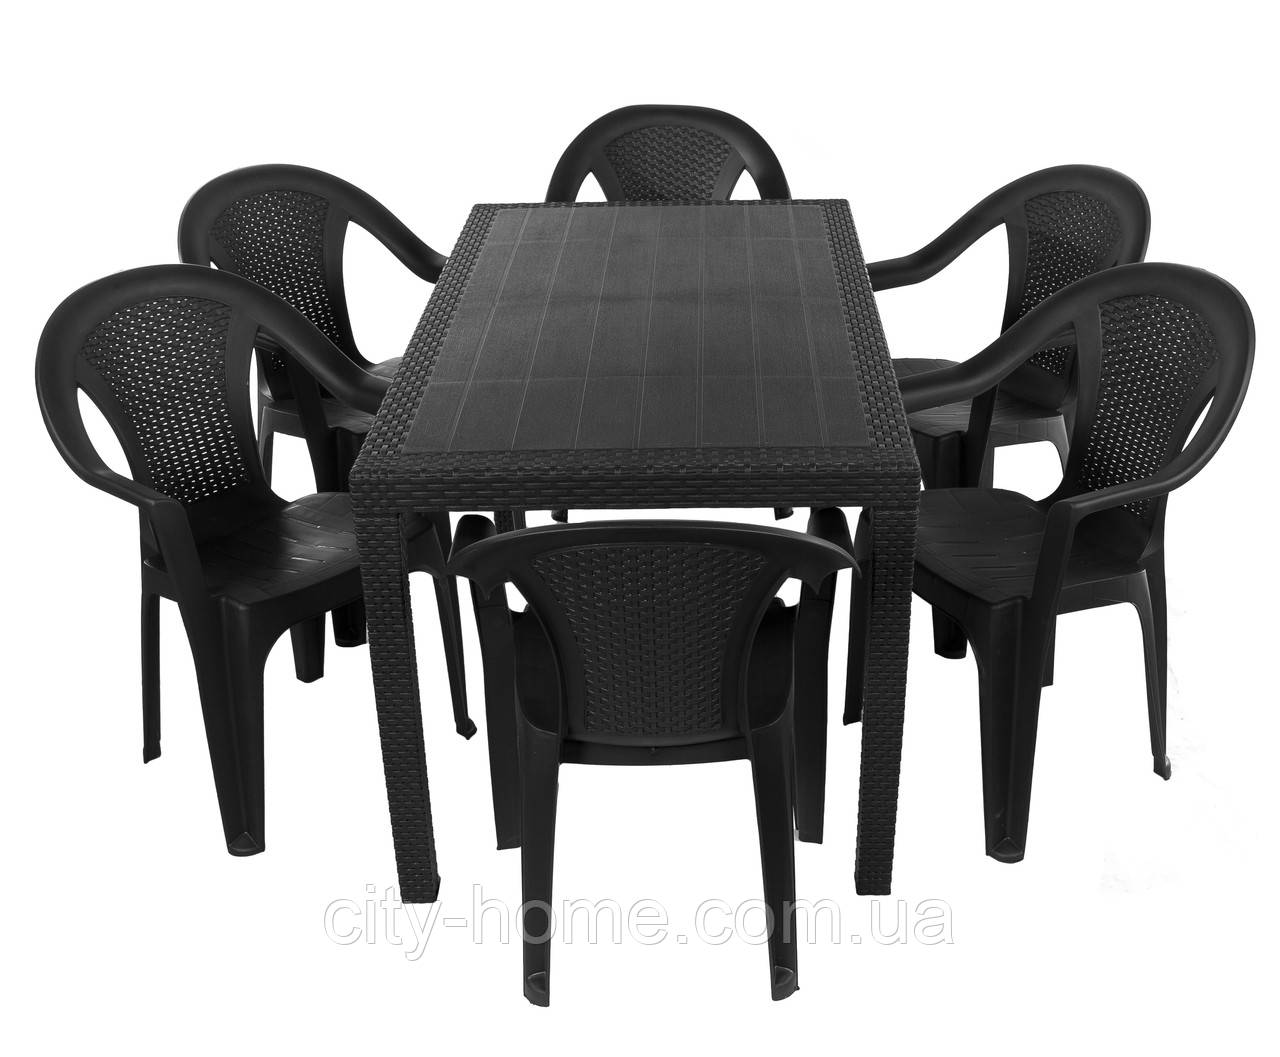 Комплект пластикових меблів Joker Ischia 6 антрацит